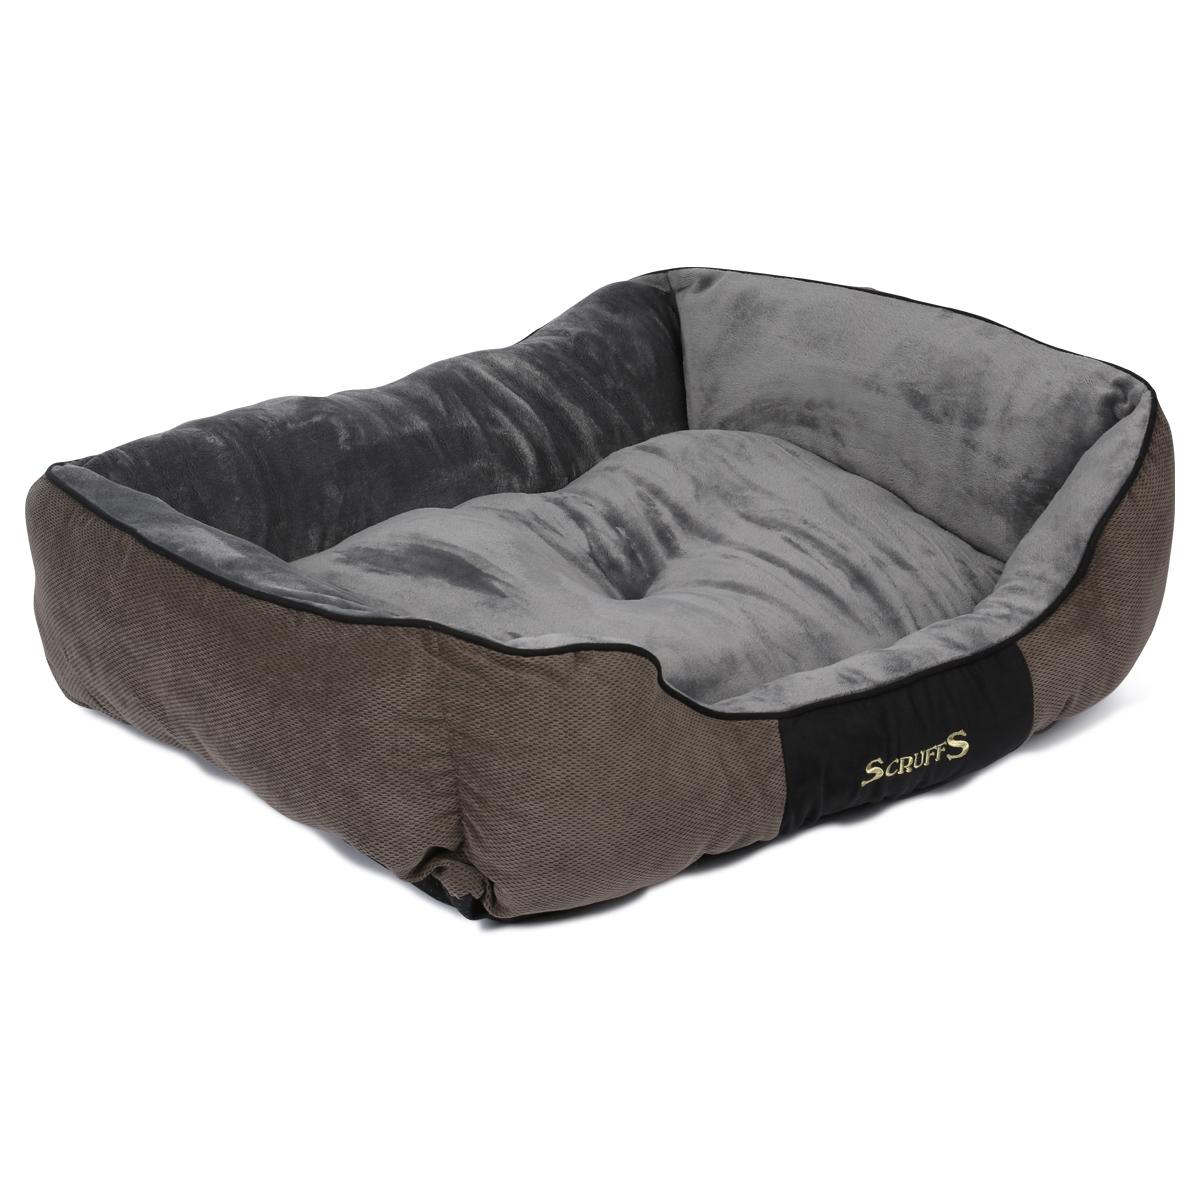 Scruffs Hundebett Chester Box Bed Grau XL